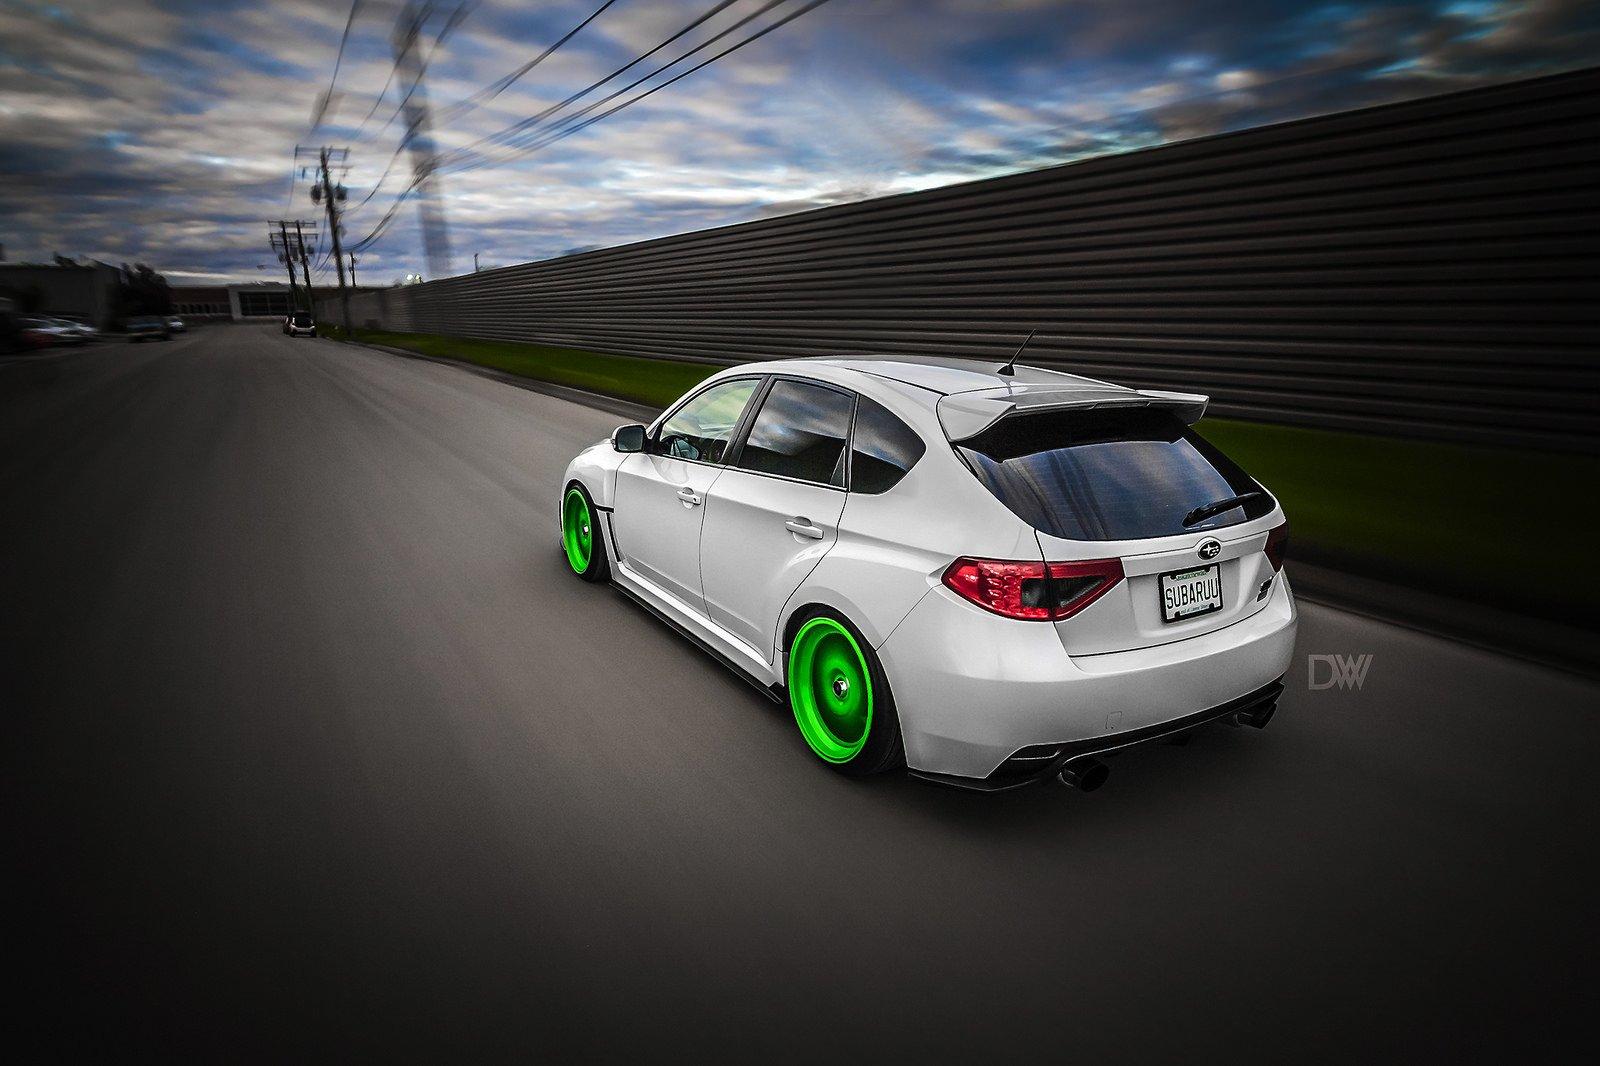 Modified Subaru Sti Wrx >> Subaru impreza wrx sportcars rallycars cars hatchback japan sedan tuning wallpaper | 1600x1066 ...